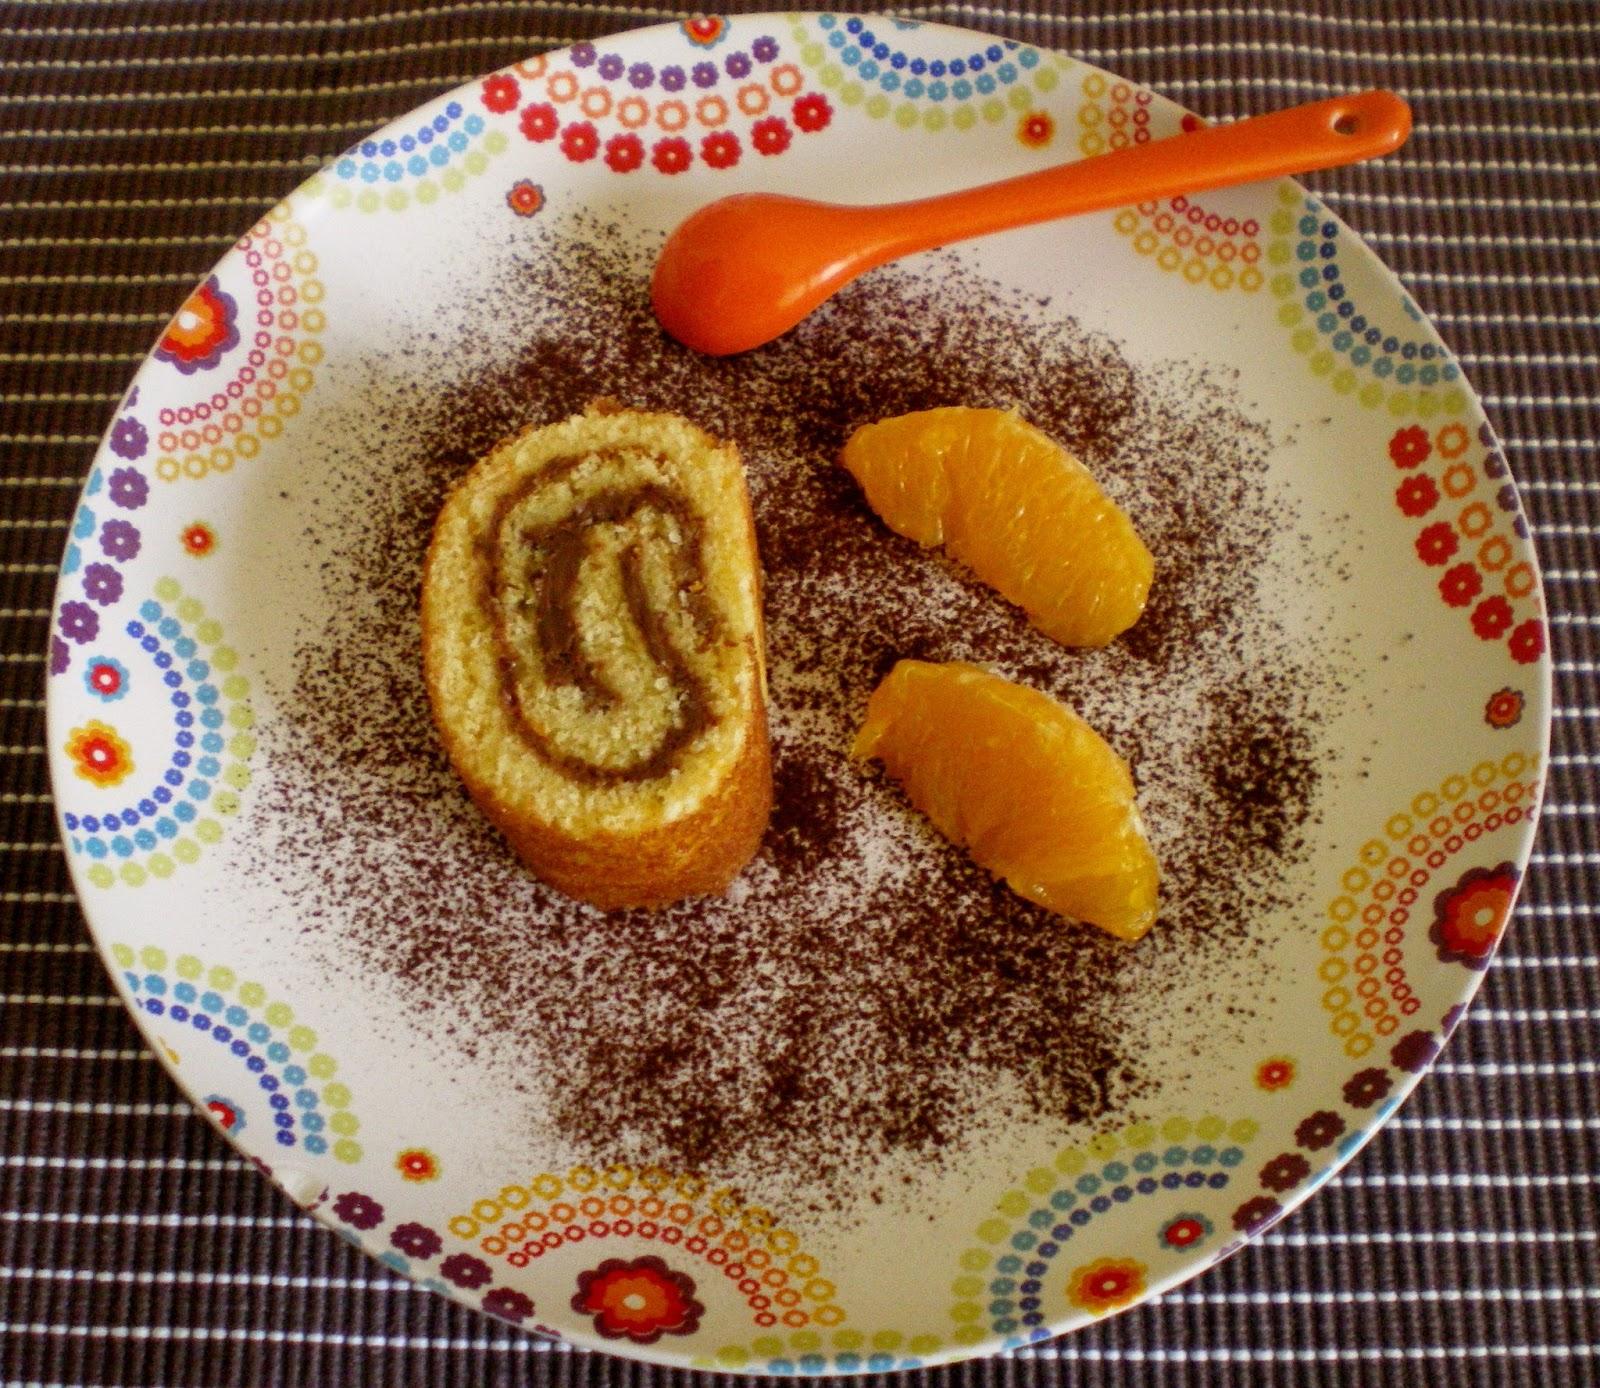 Gateau orange du chef piege